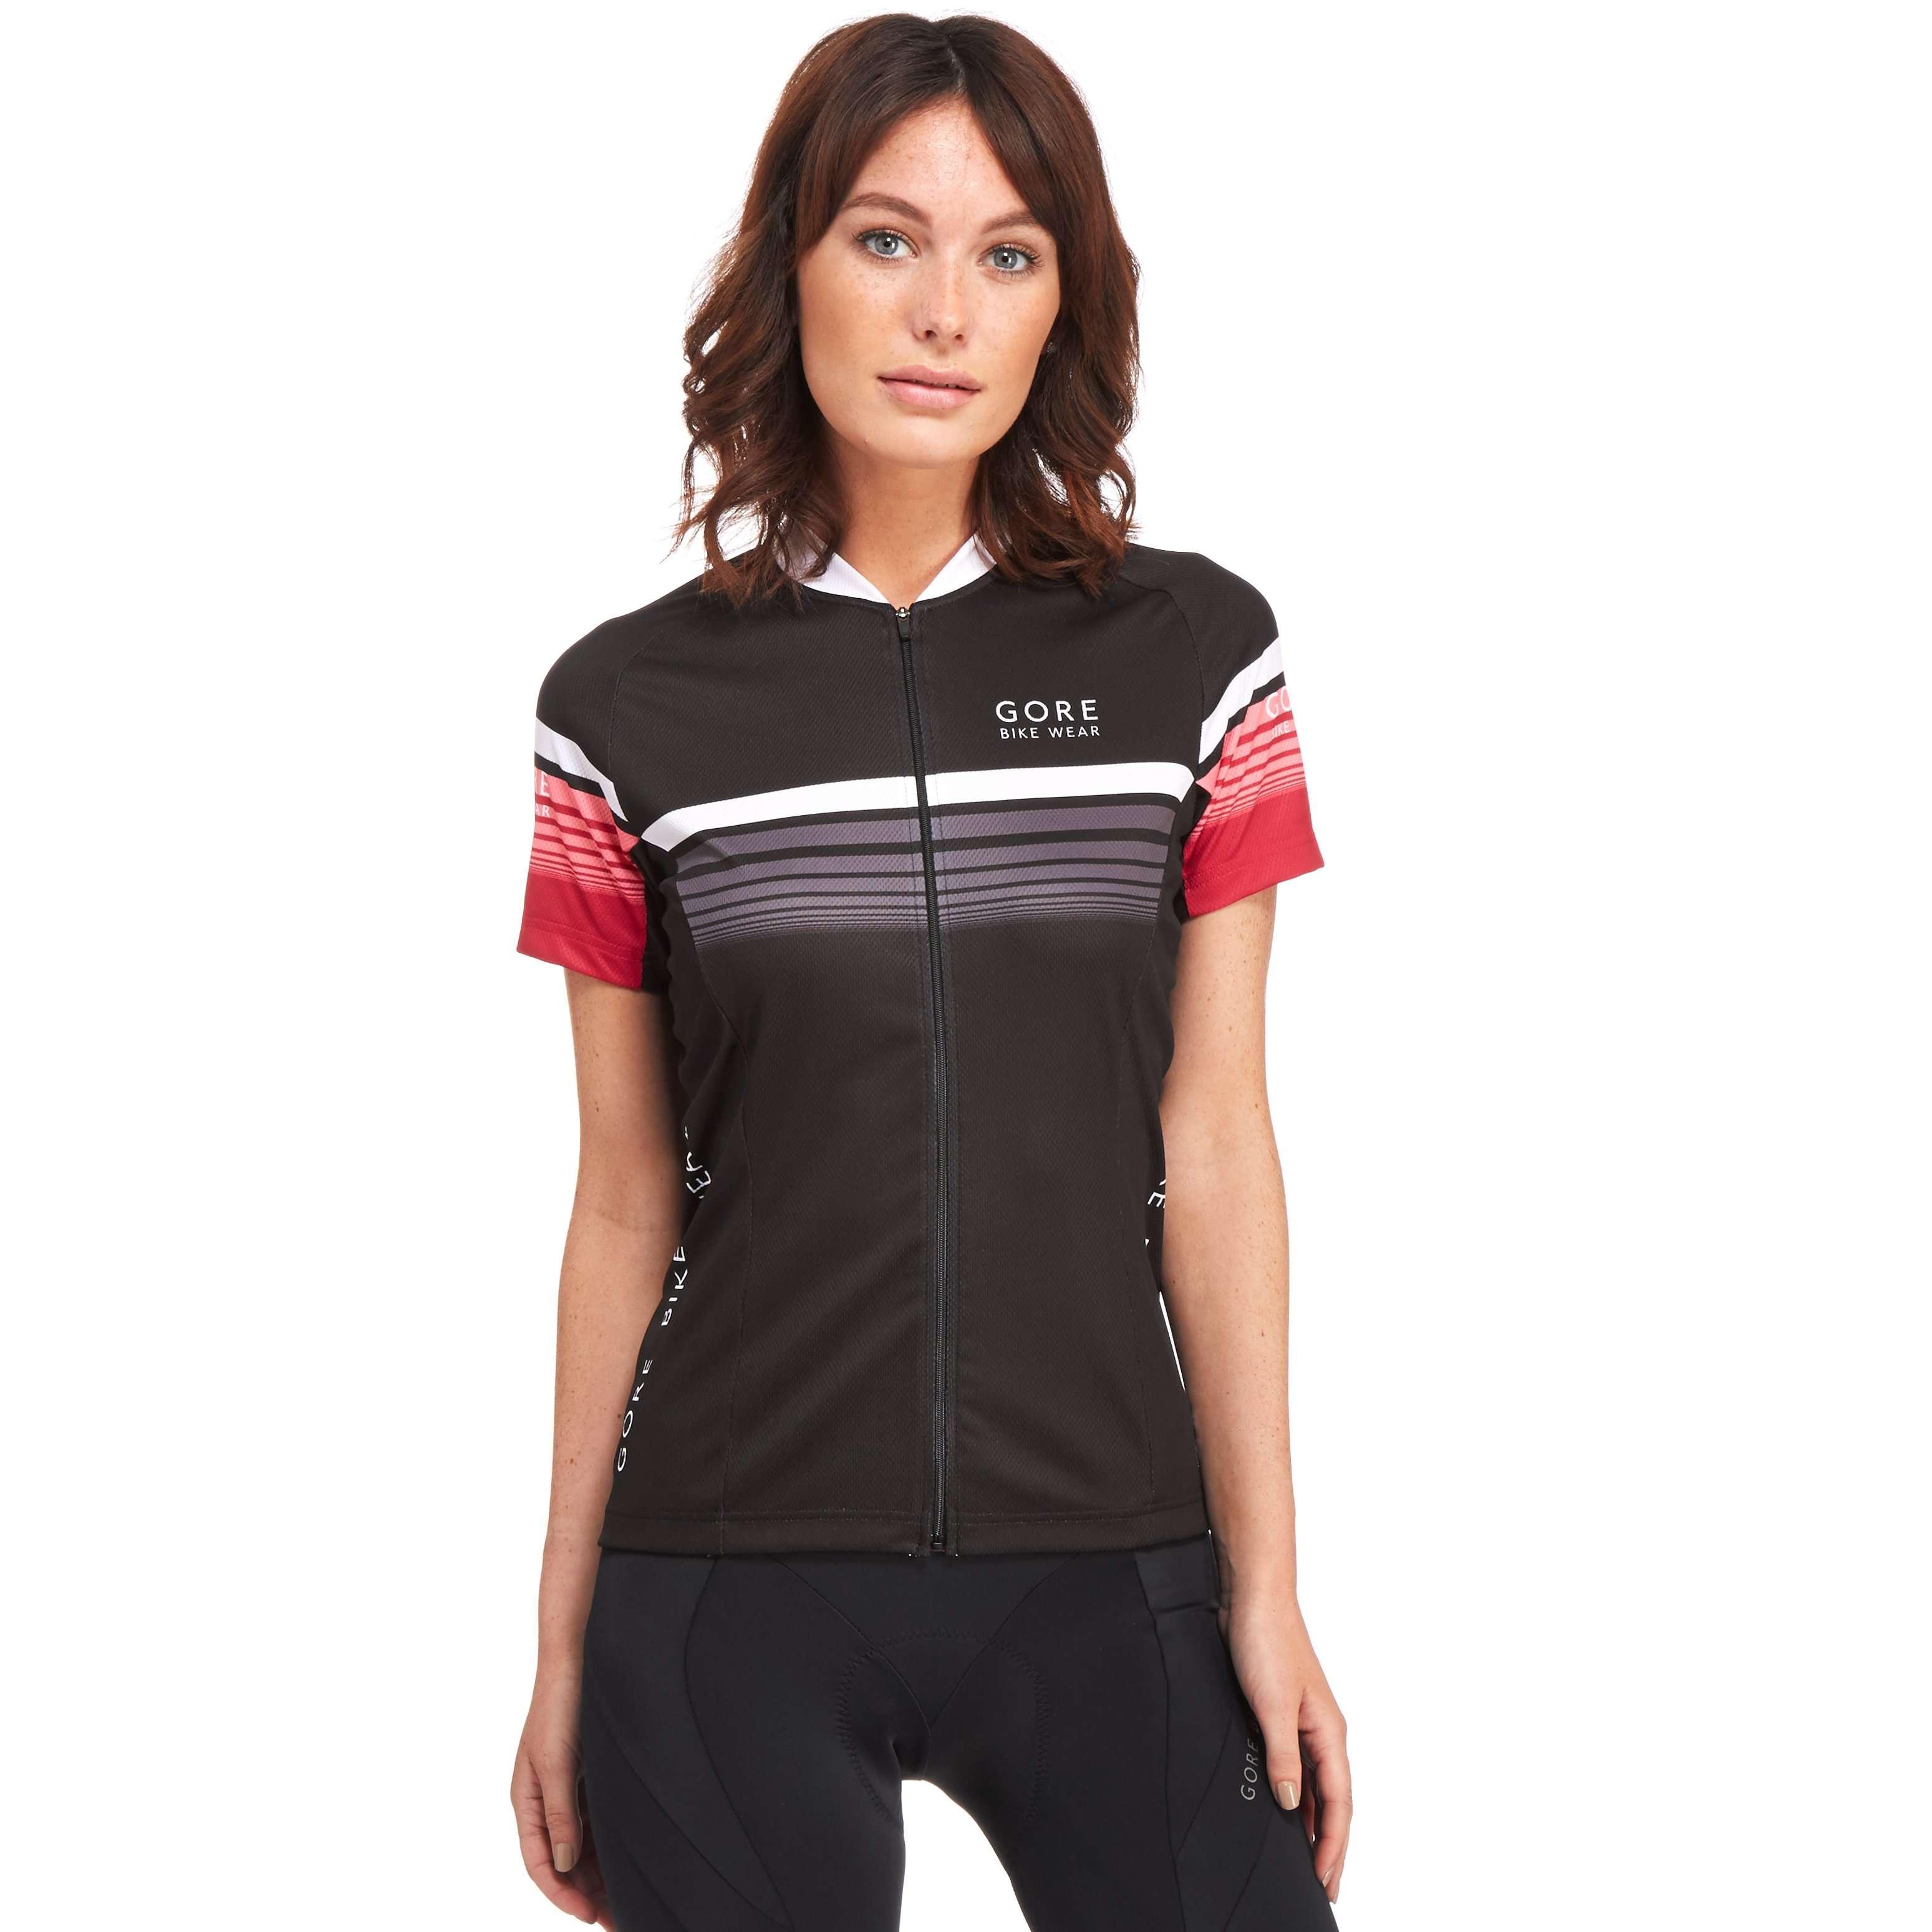 GORE Women's Element Speedy Jersey